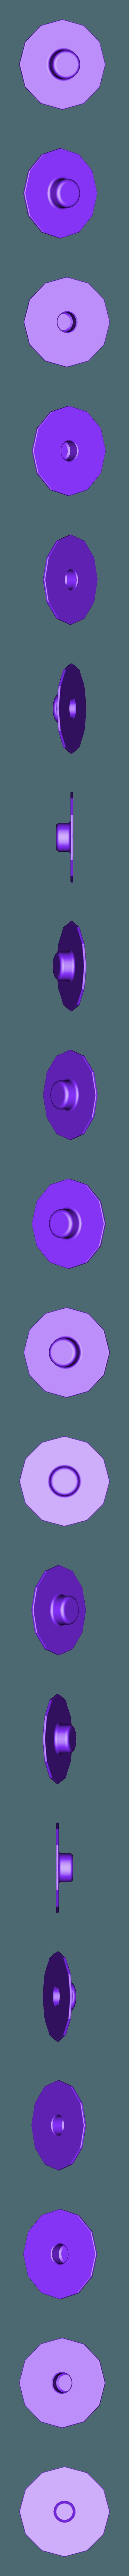 spool_plate.stl Download free STL file Anycubic Kossel 608 Bearing Top Spool Holder • 3D printable model, VICLER